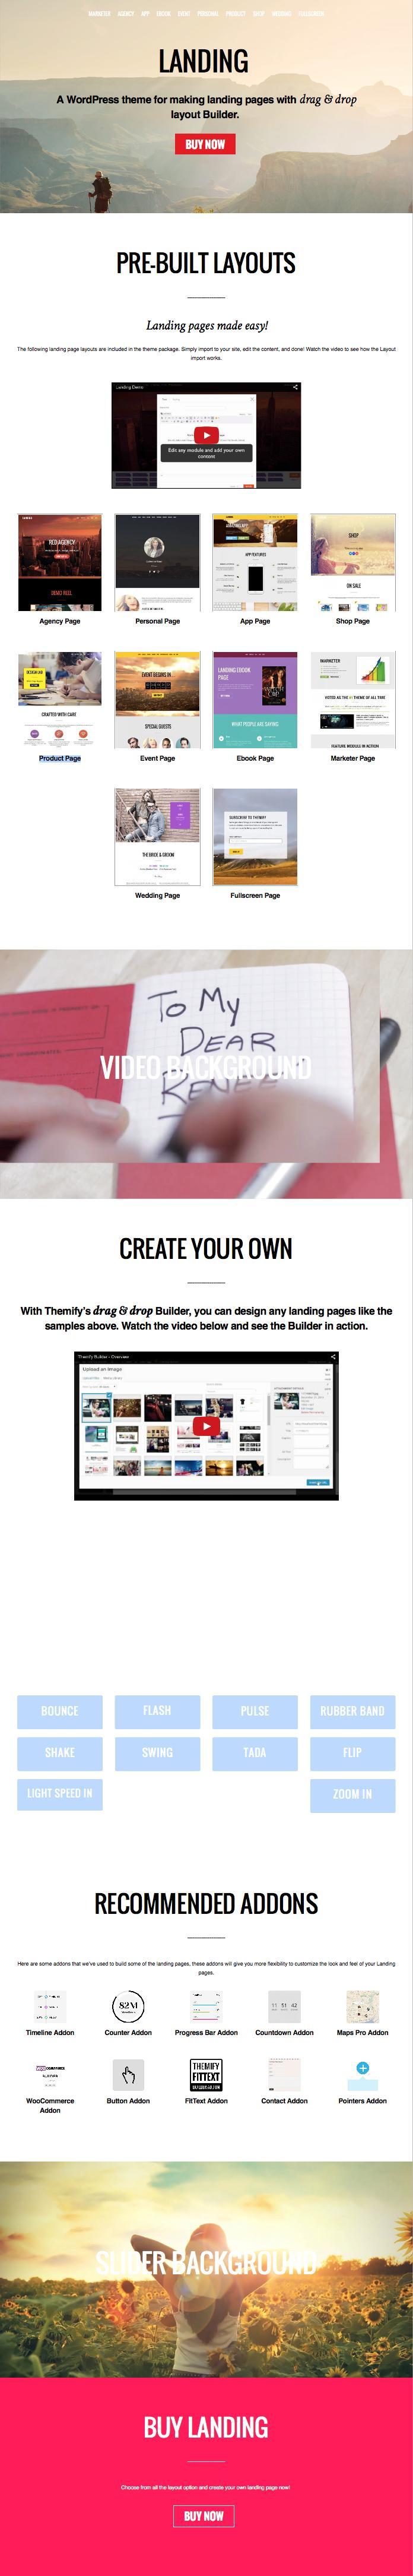 Landing WordPress Product Promotion Theme